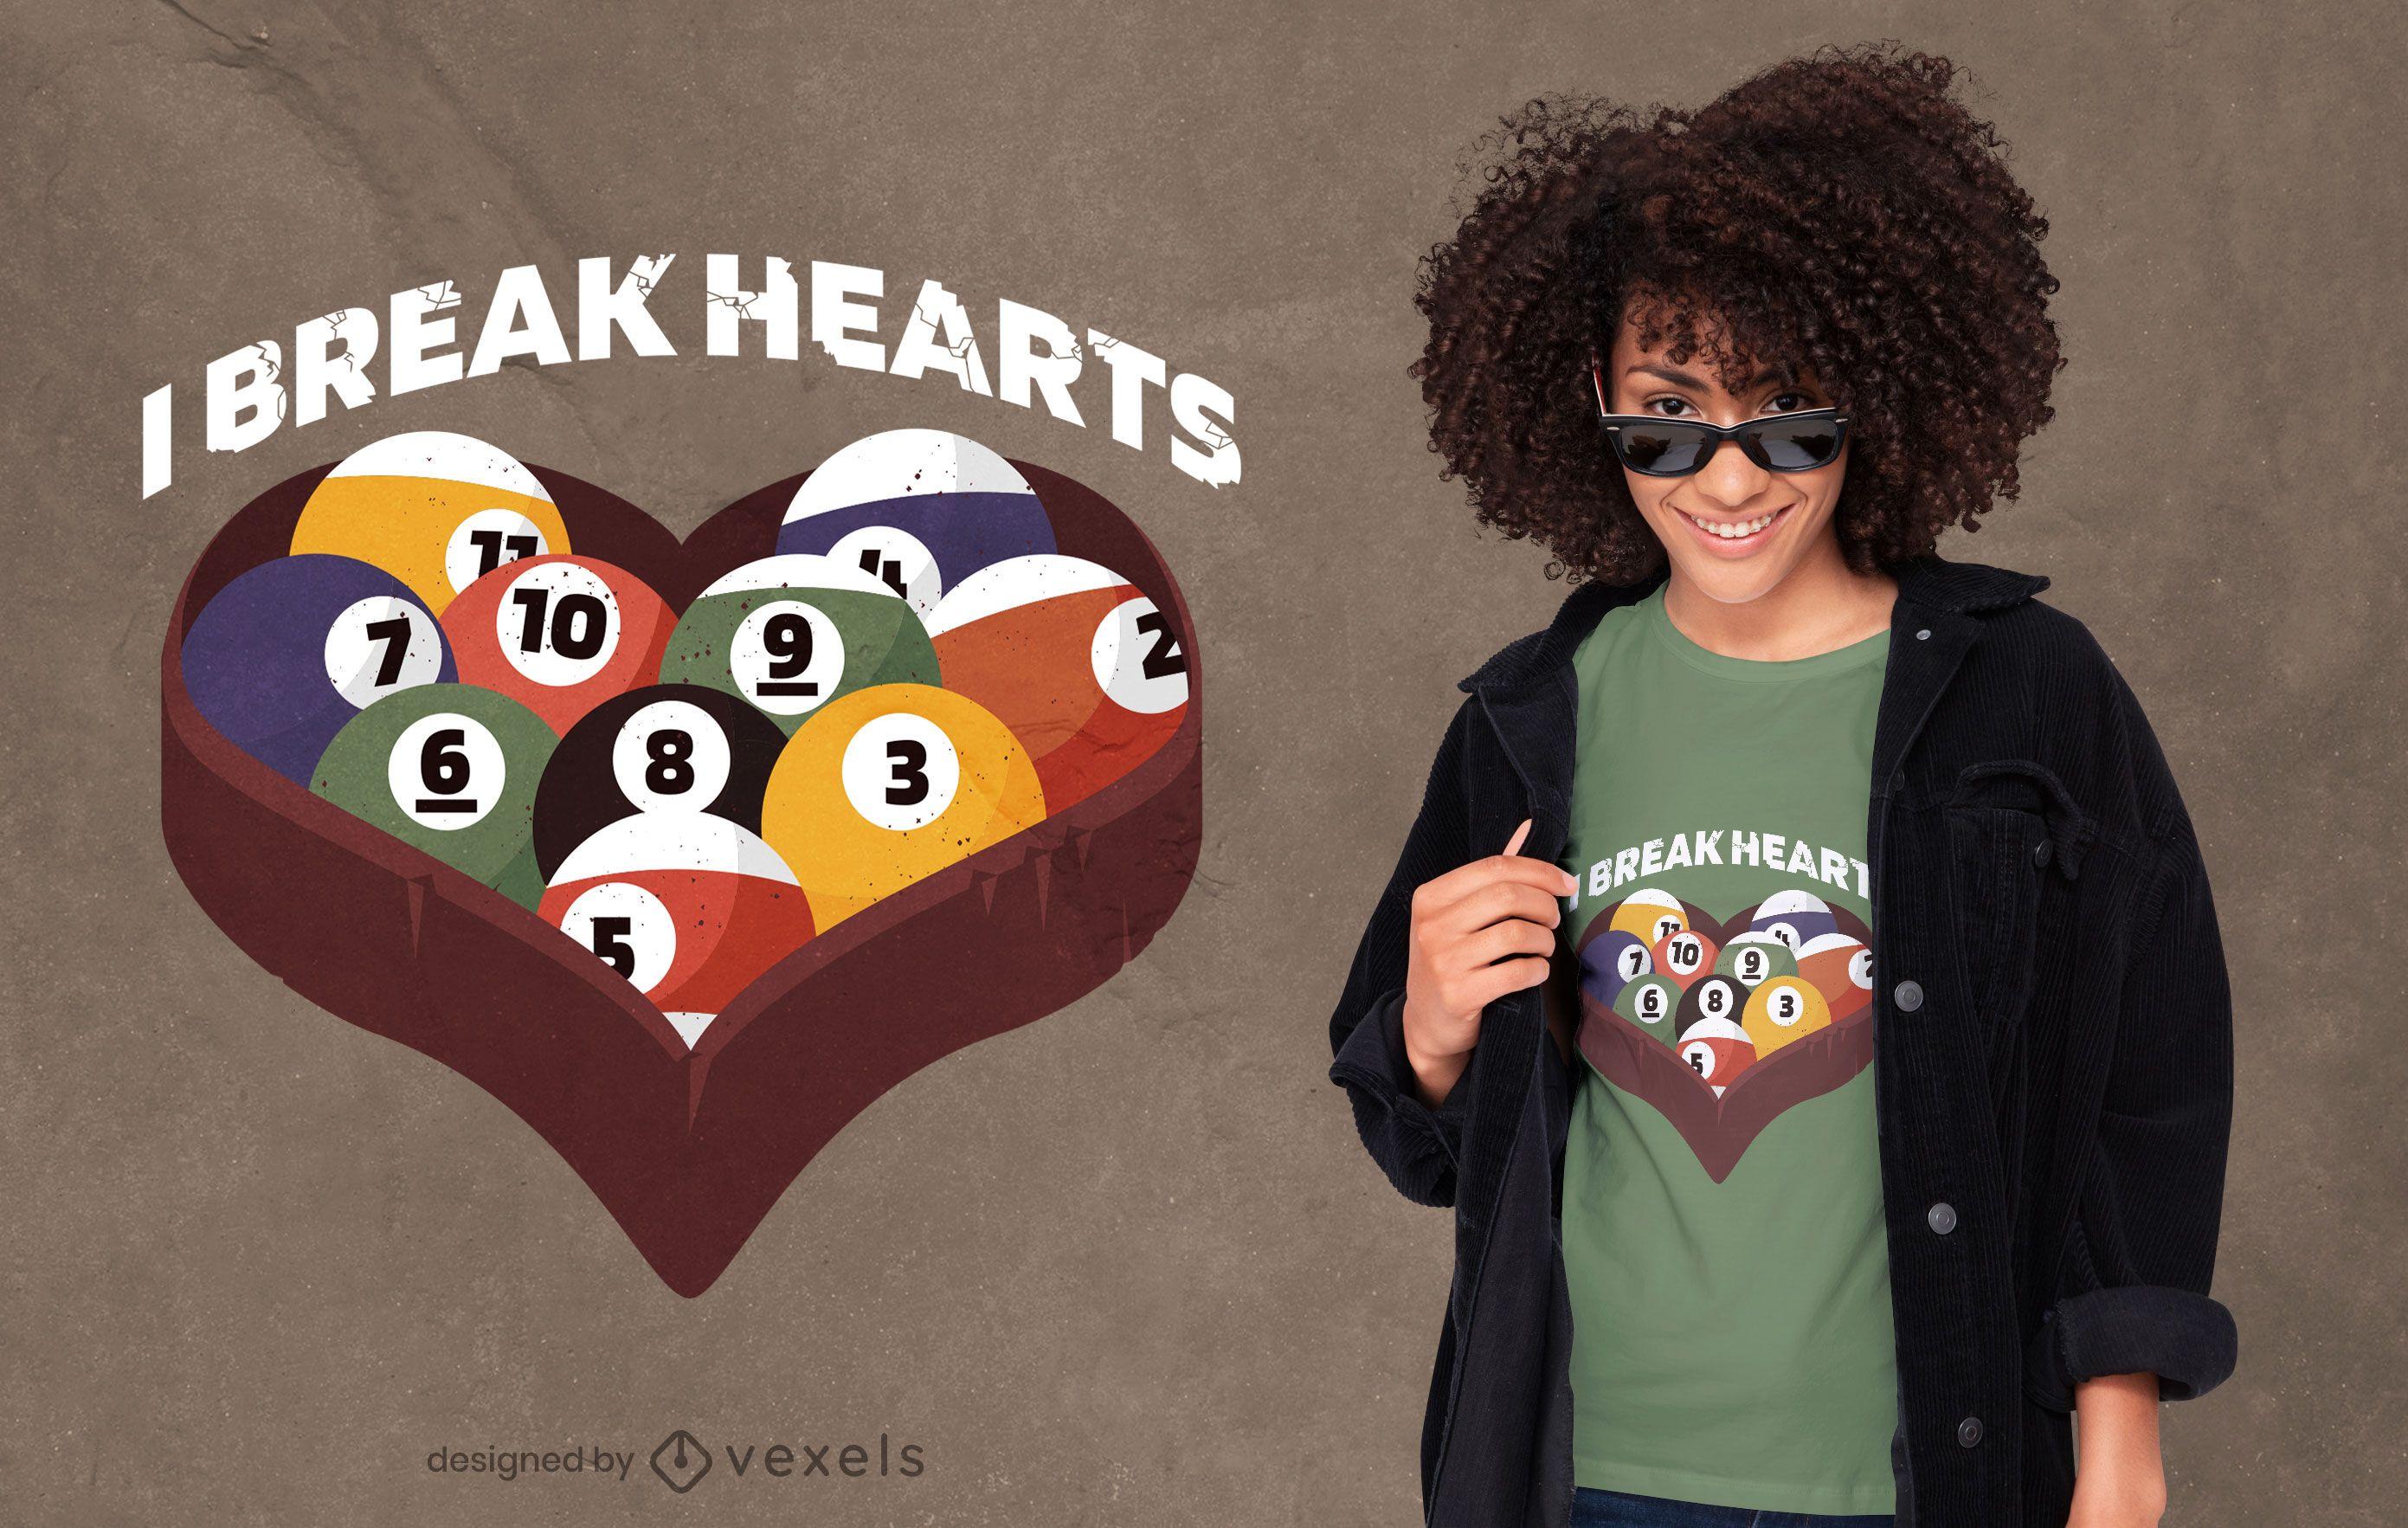 Diseño de camiseta con cita de corazón de bola de billar